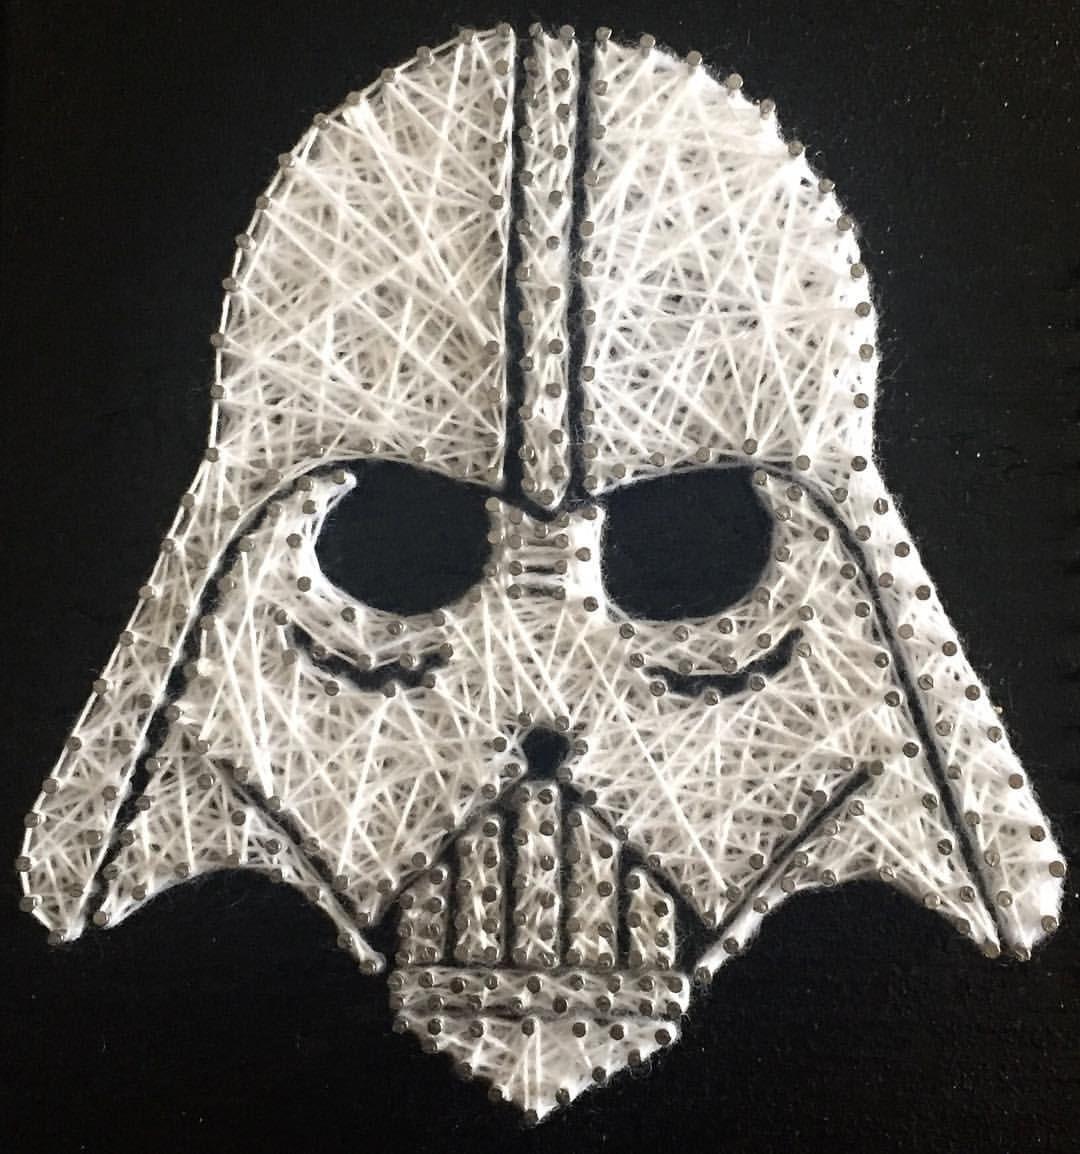 "Cuadro String Art ""Darth Vader"" #hilorama #clavos #hilos #nails #wood #homemade #diy #manualidades #stringart #fils #madera #string #hechoamano #manualitats #darthvader #starwars #decoracion #decoration #decoracio #claus"